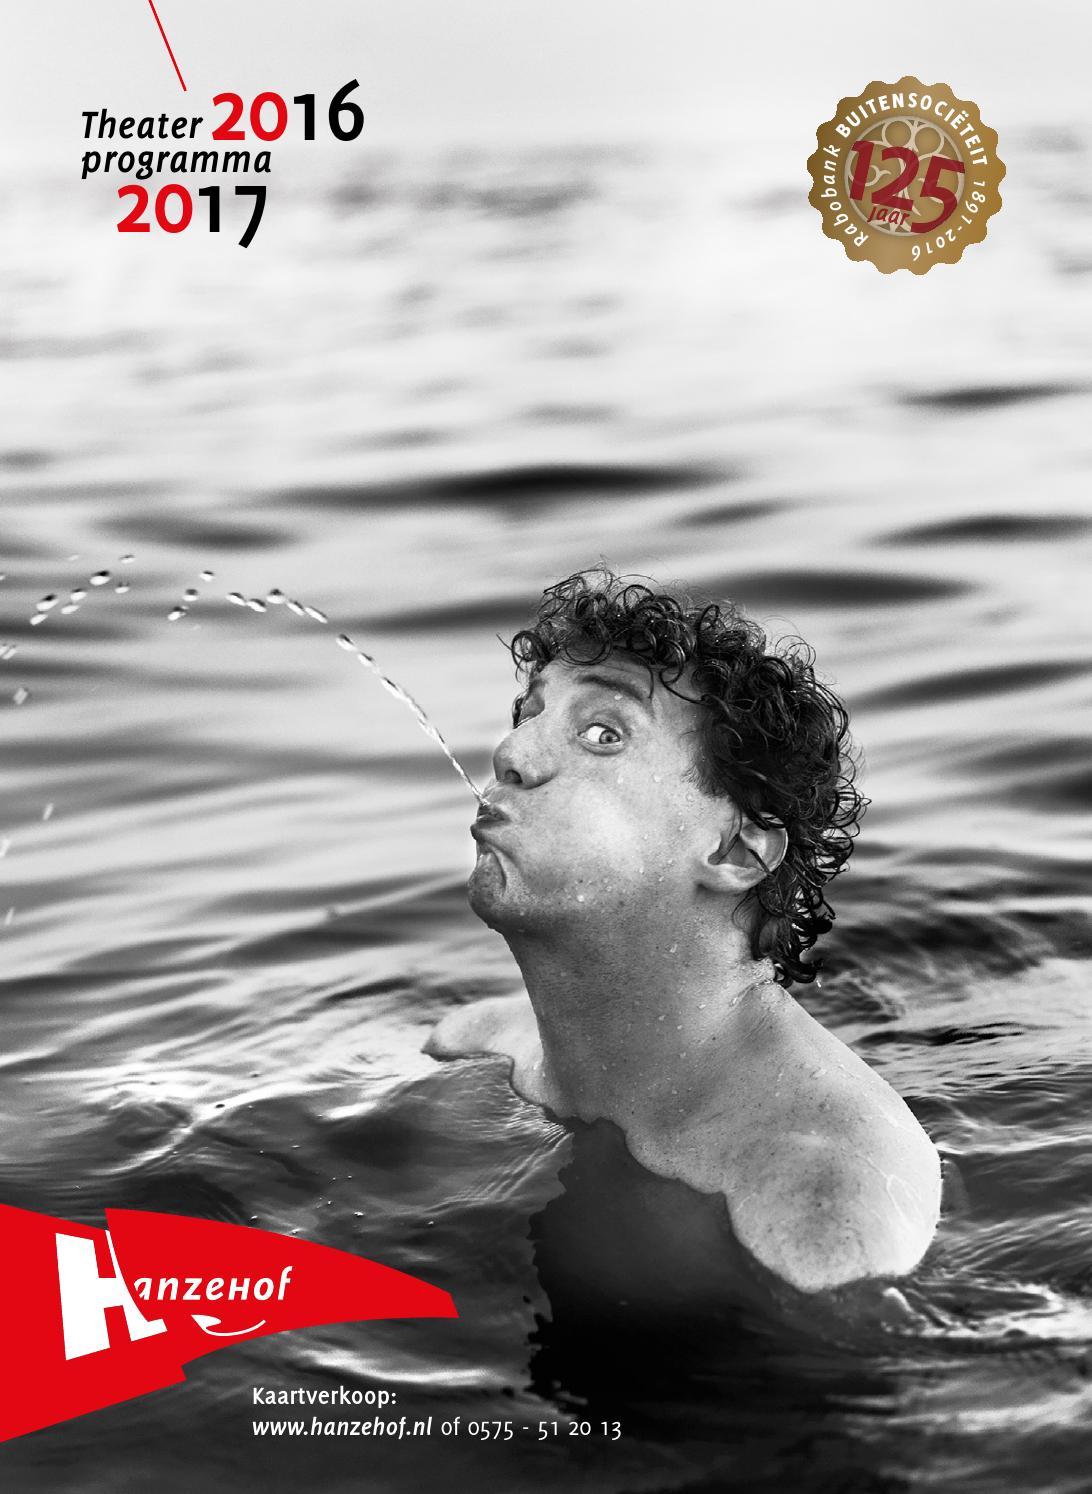 Theater de Koornbeurs Seizoensbrochure 2015 - 2016 by ...